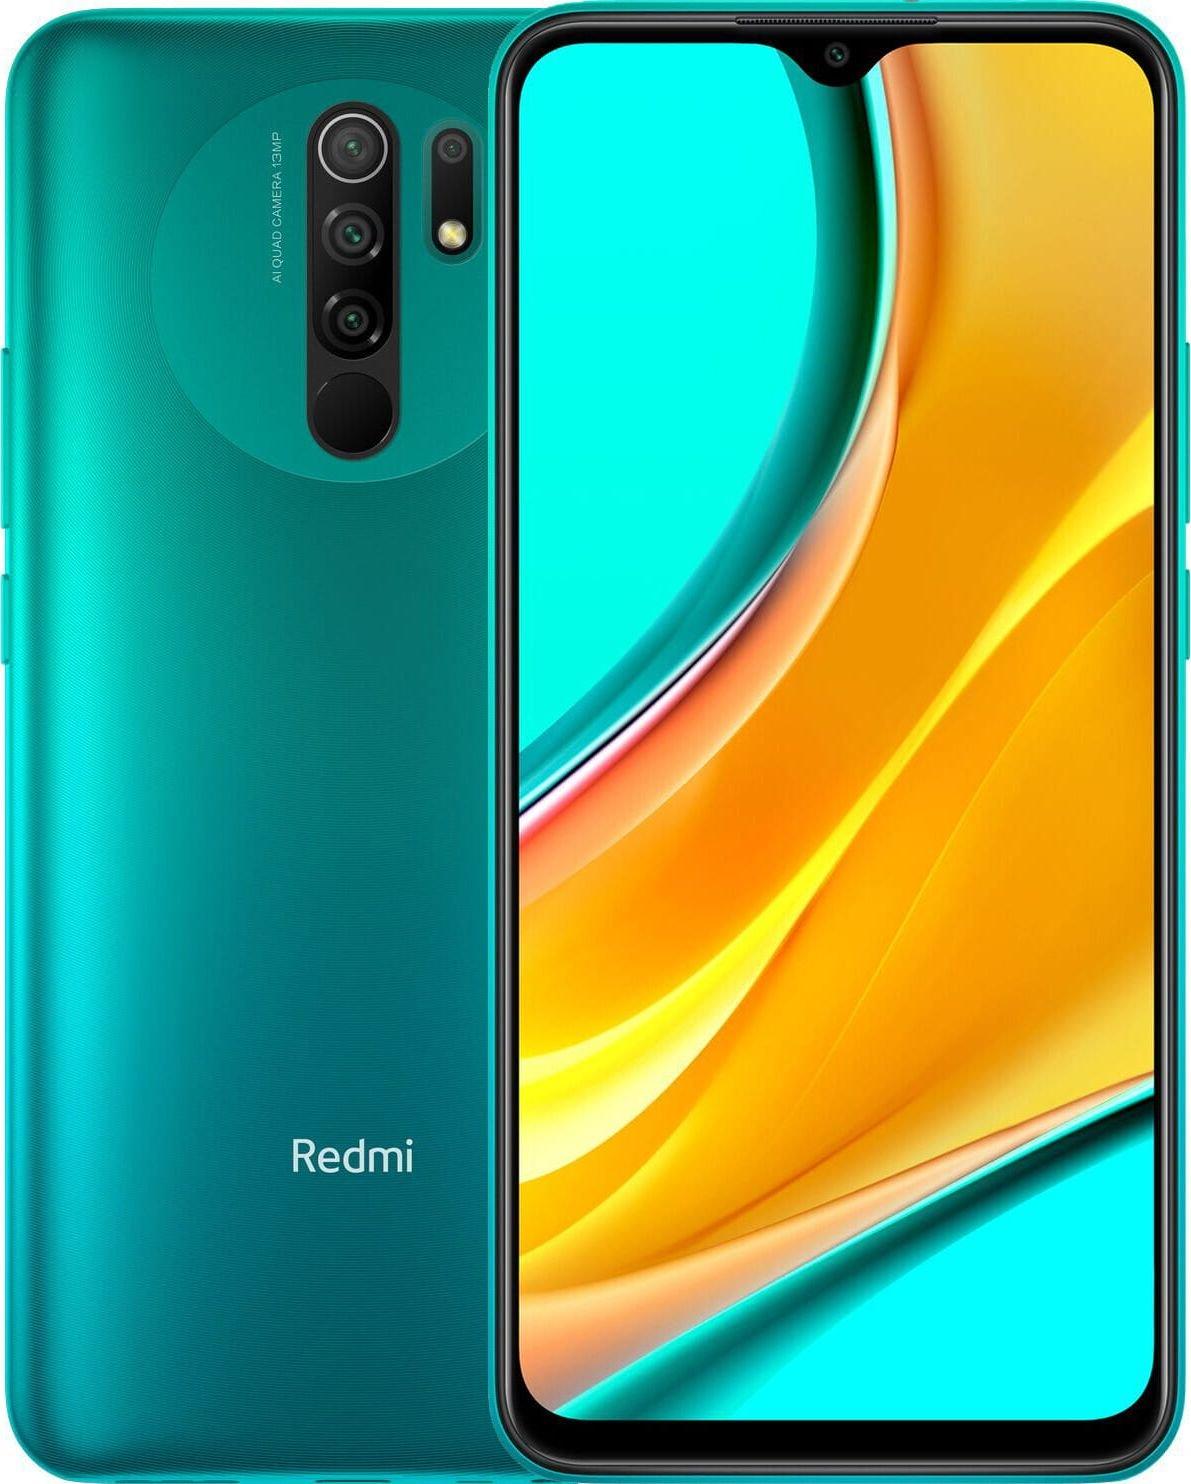 Smartfon Xiaomi Redmi 9 32 GB Dual SIM Zielony (28424) xiaomi_20200630165853 Mobilais Telefons